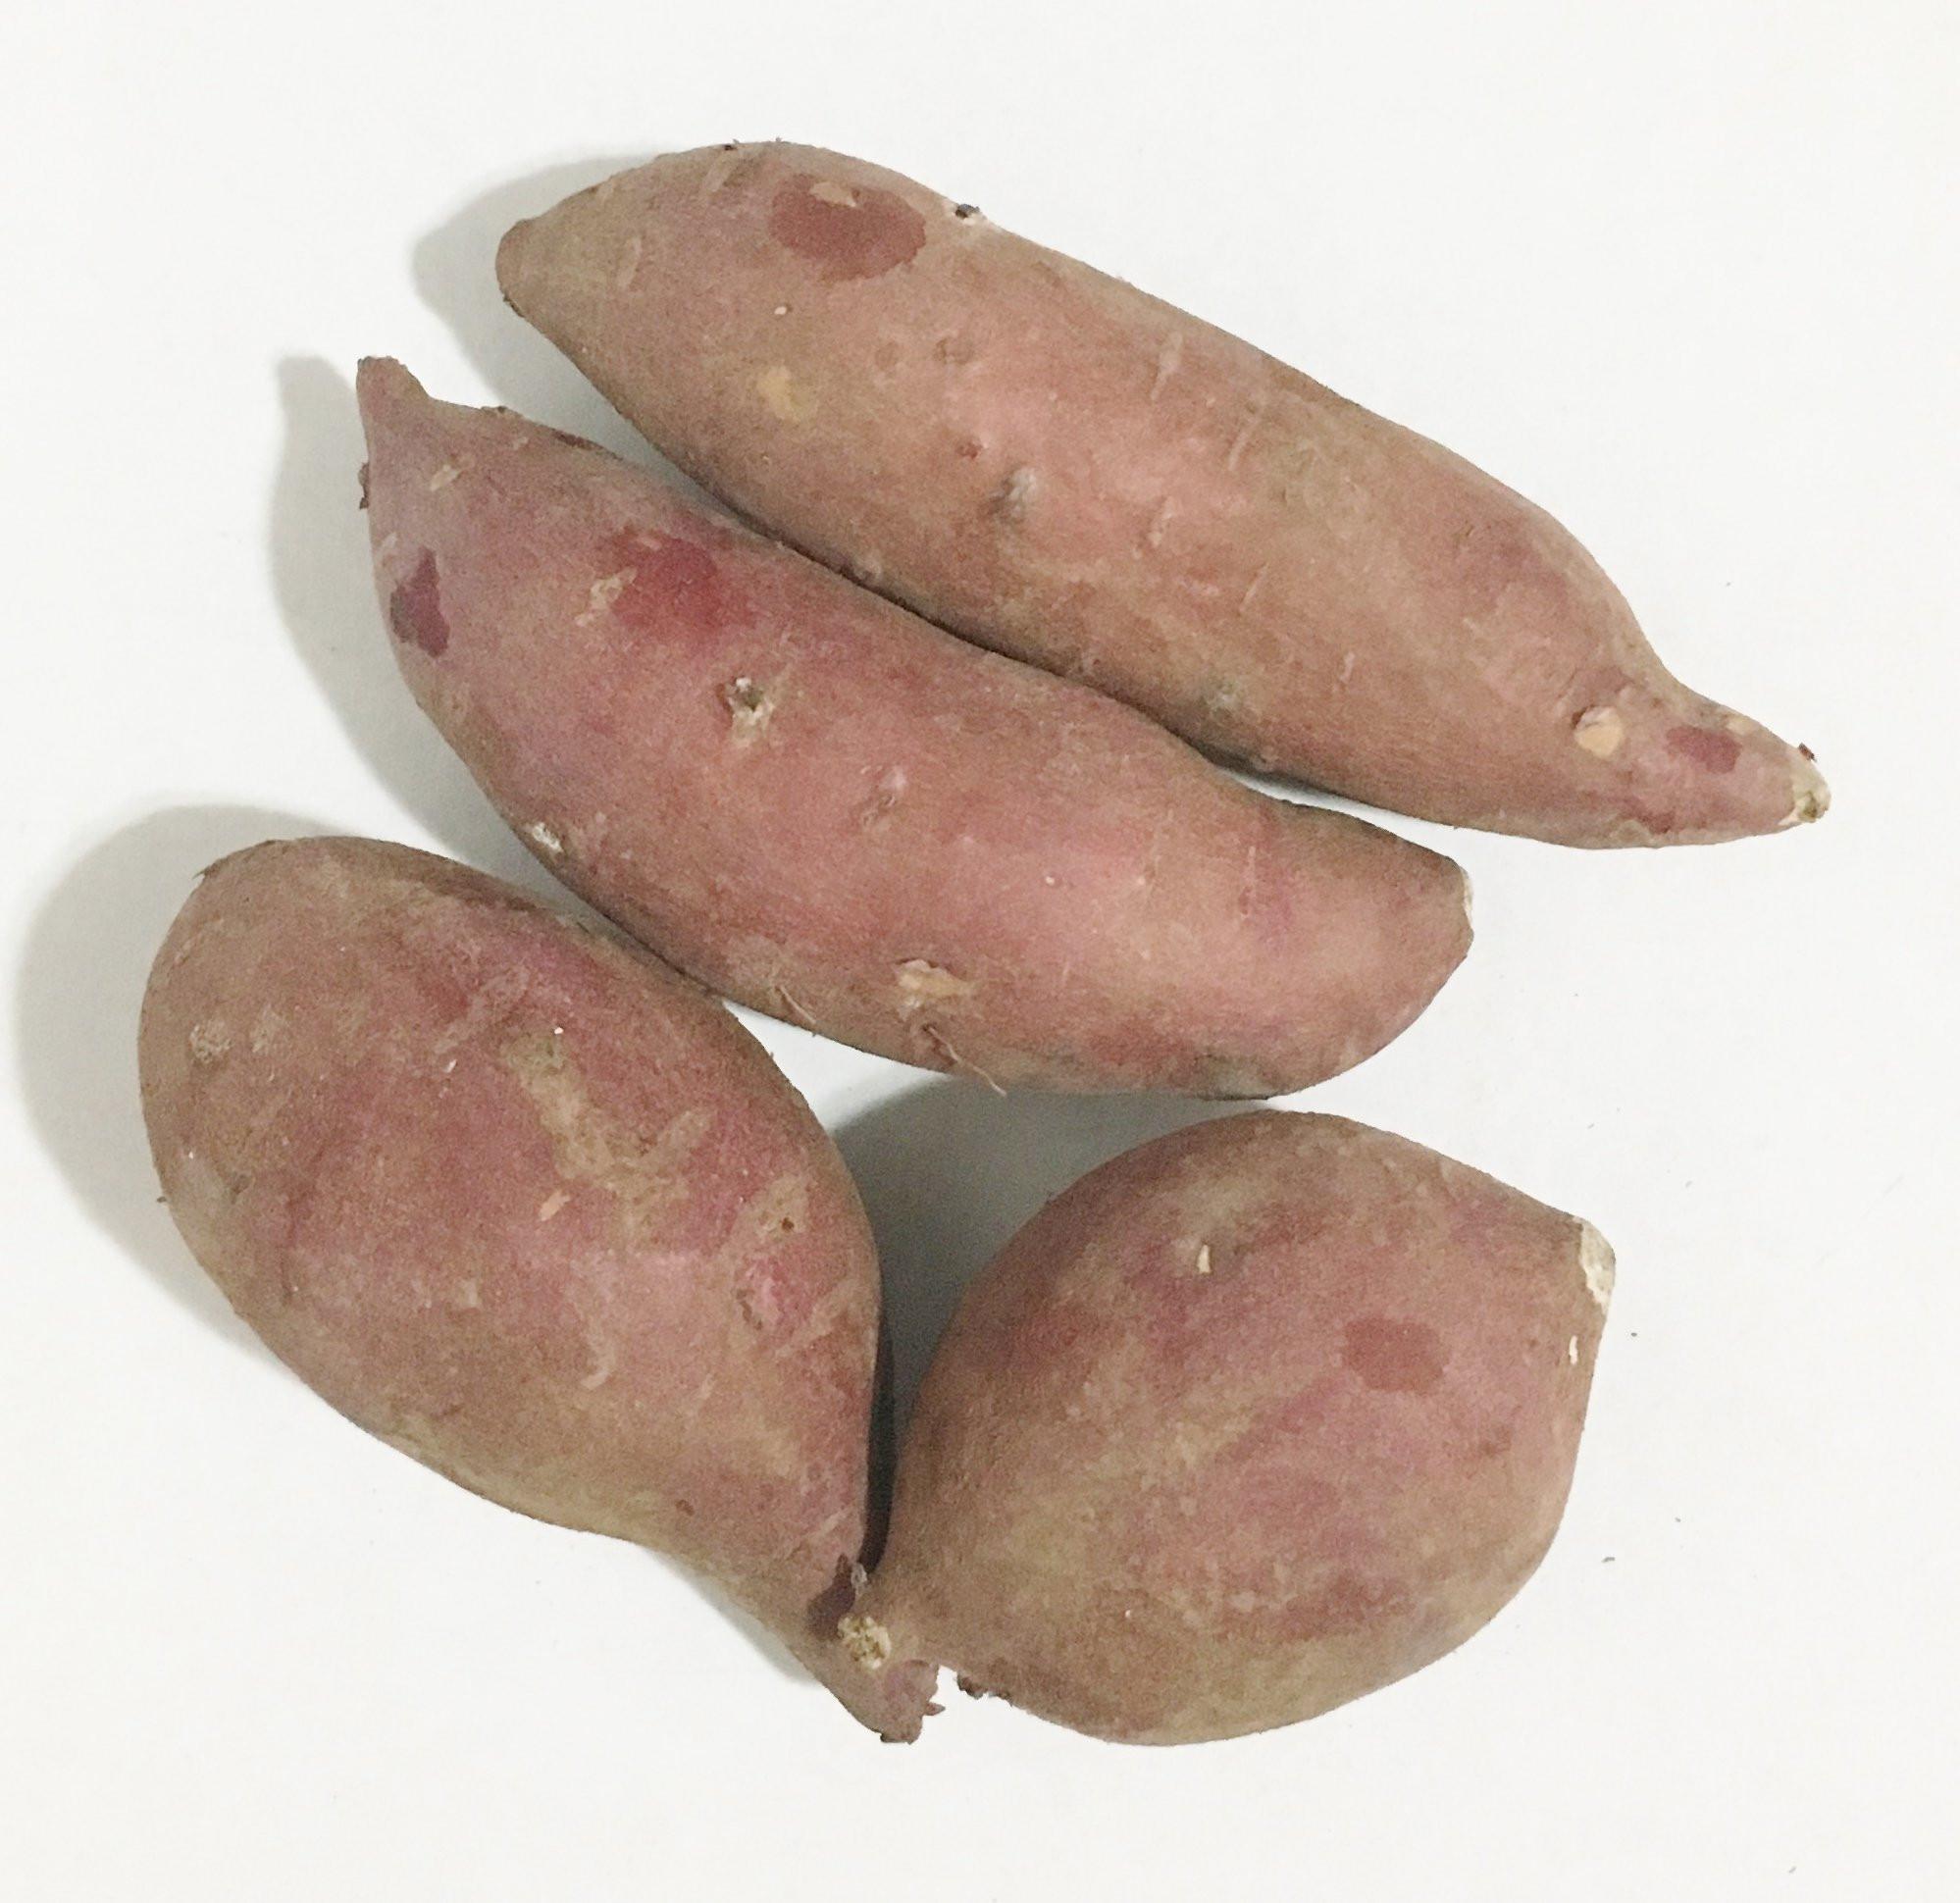 Potato In Japanese  Amazon Fresh Purple Sweet Potatoes 2LBS